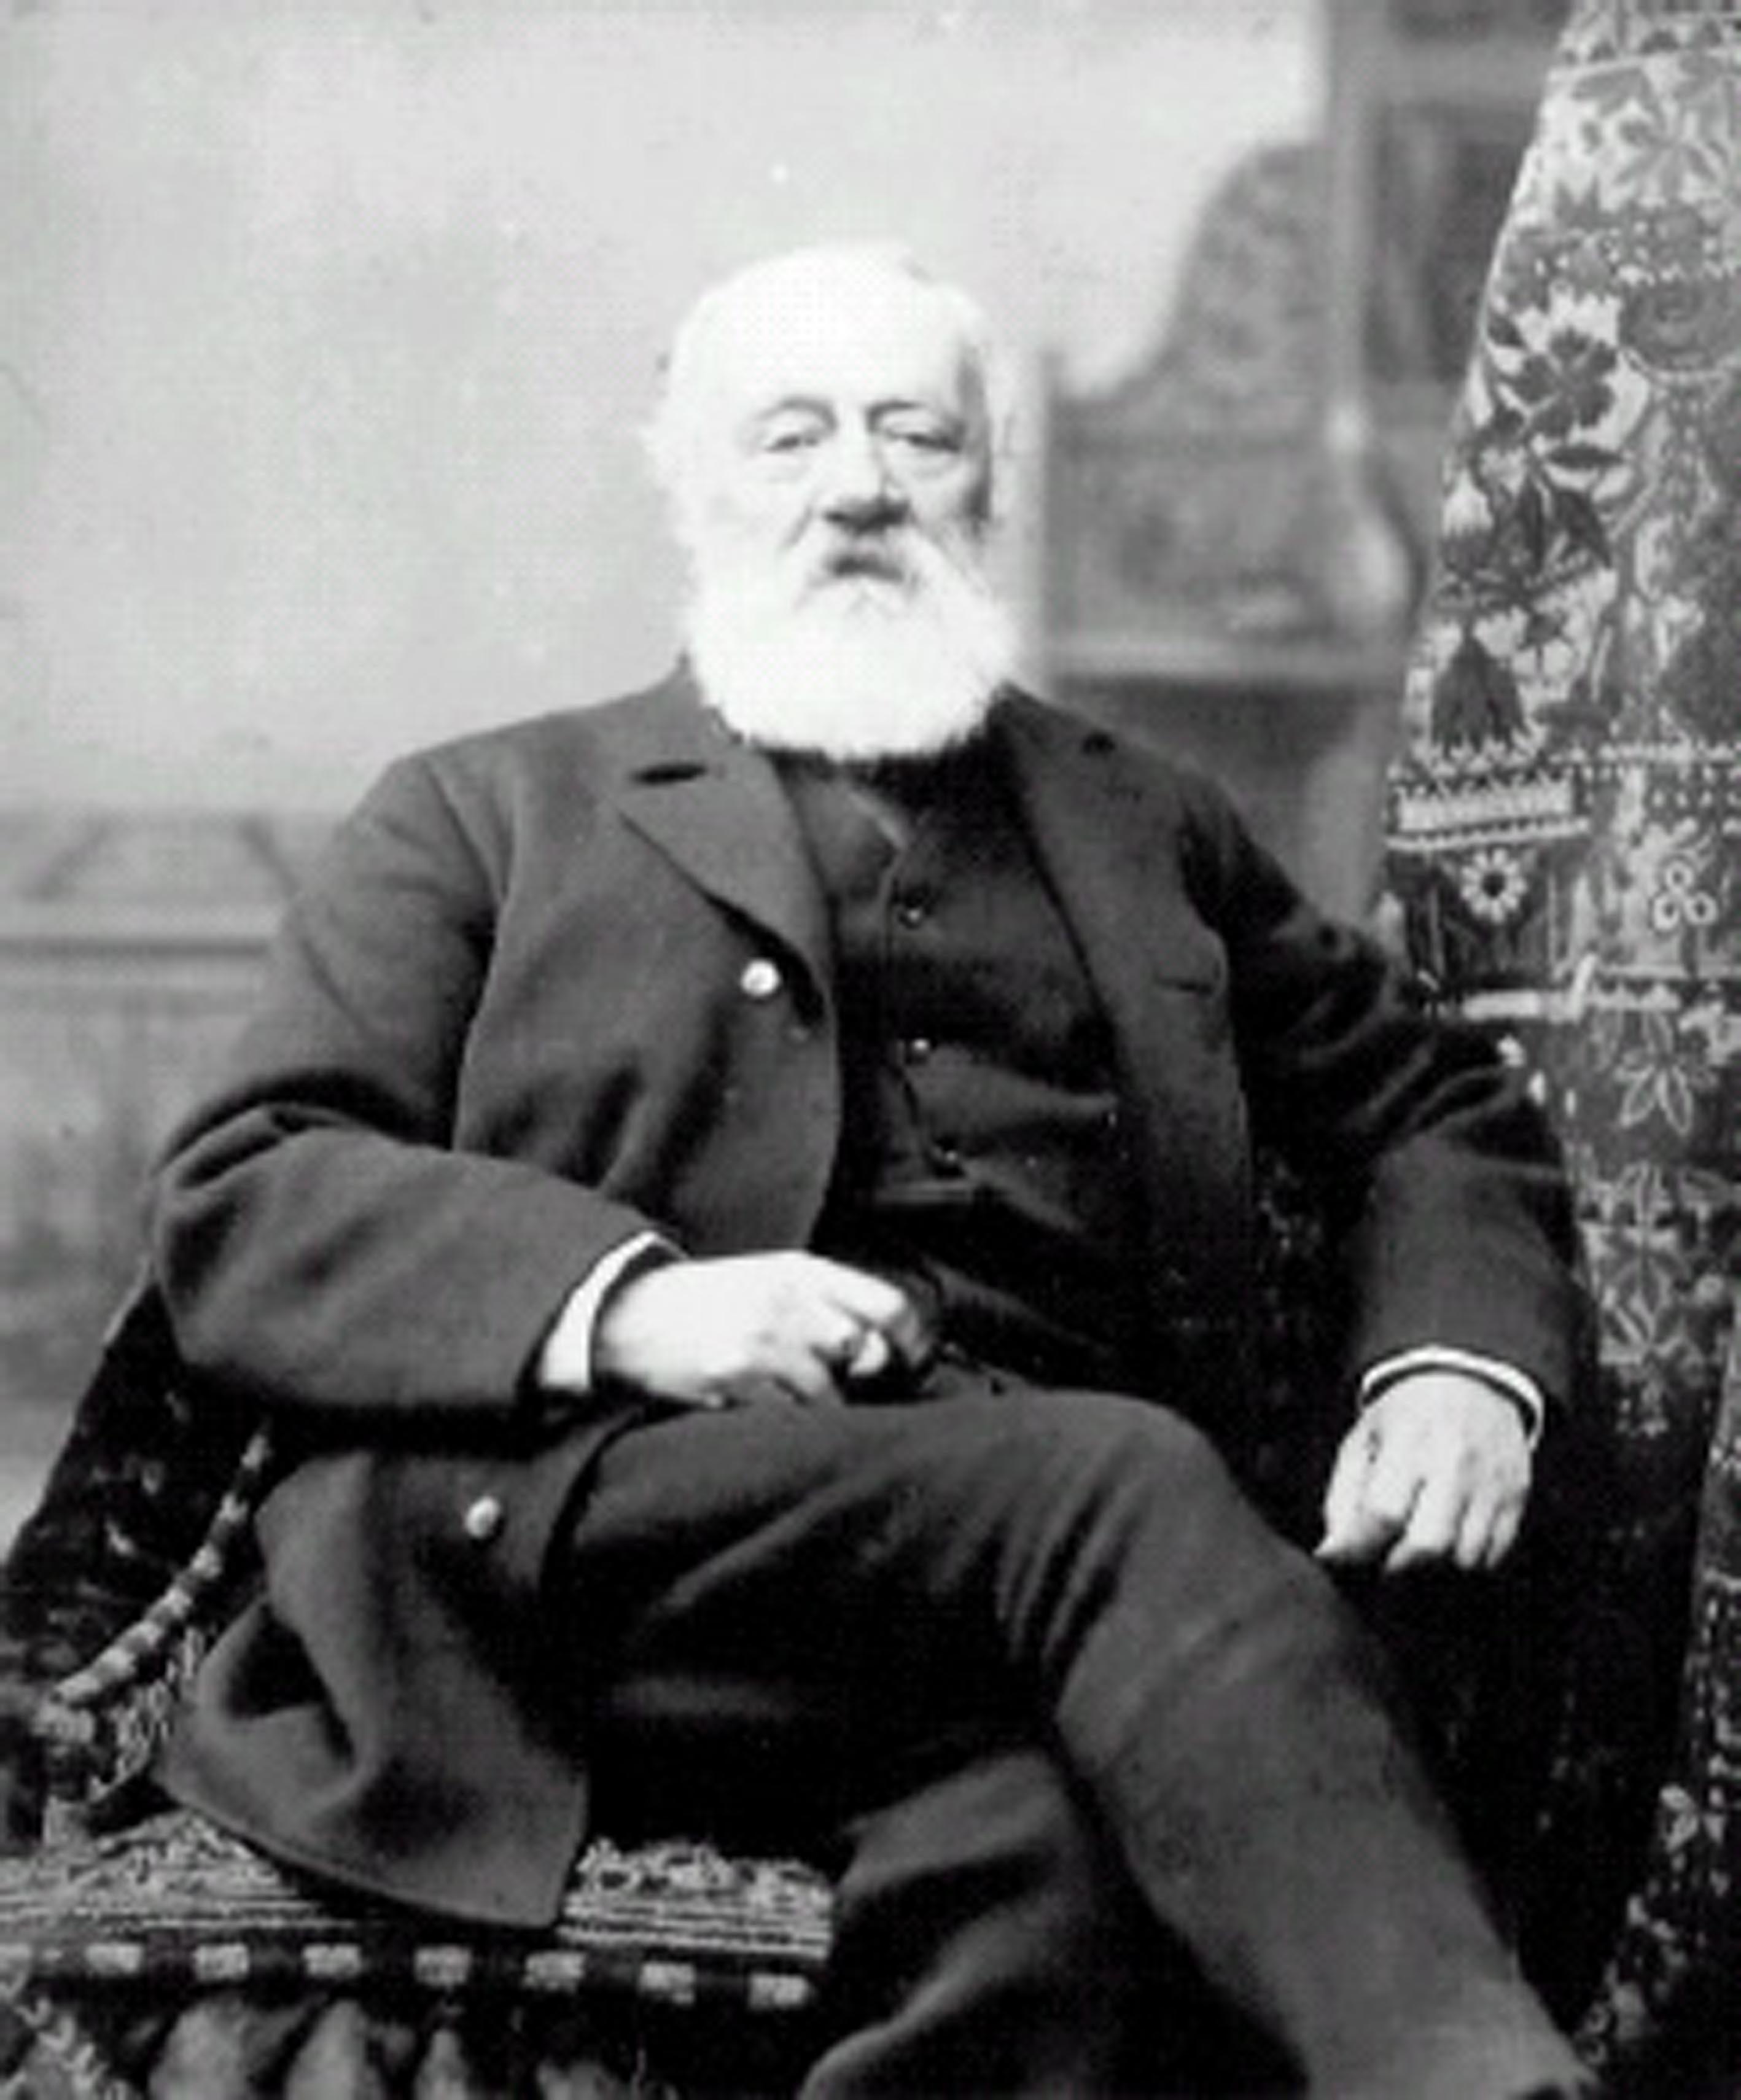 http://upload.wikimedia.org/wikipedia/commons/7/75/Antonio_Meucci.jpg